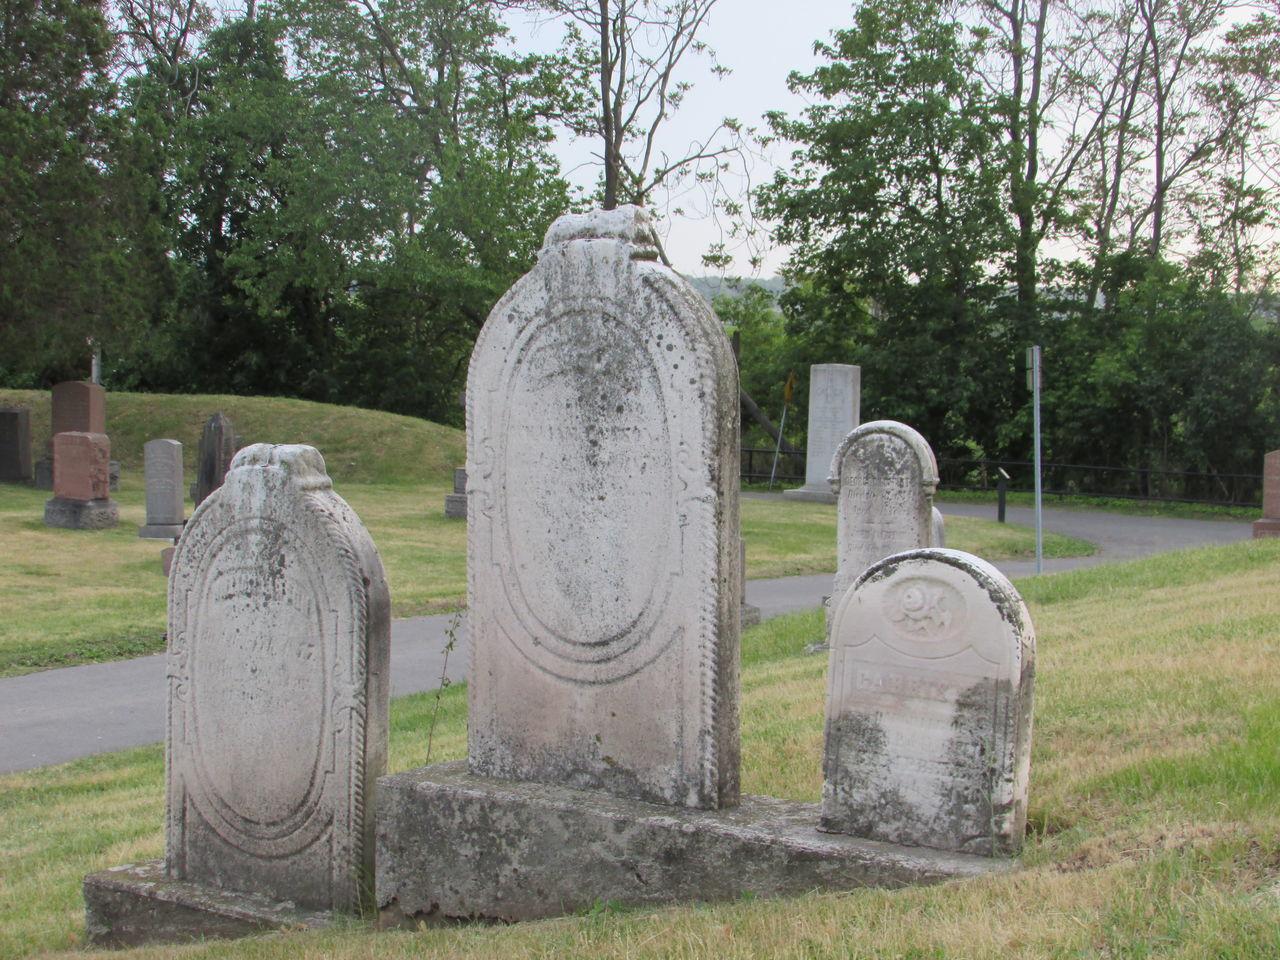 tombstone, cemetery, memorial, tree, graveyard, gravestone, day, grave, no people, outdoors, spirituality, grass, sky